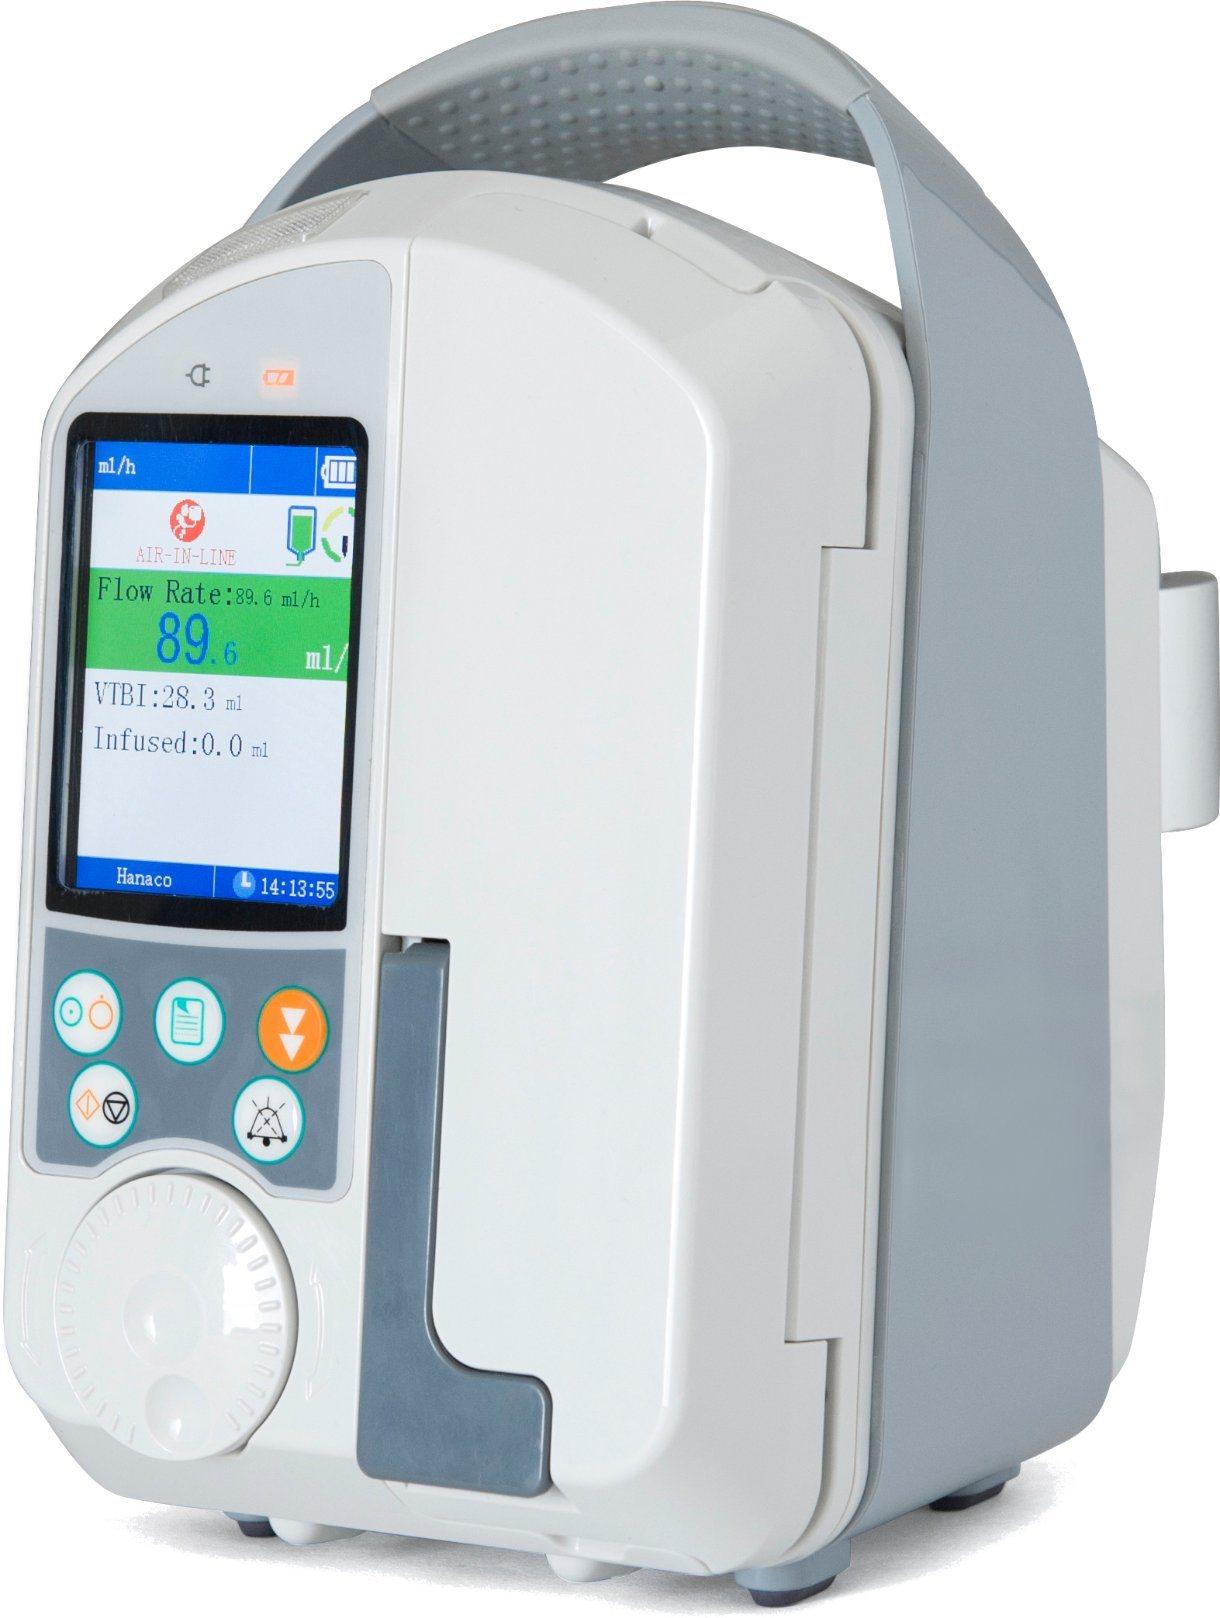 [Hot Item] Medical IV Drug Ambulance Infusion Pump Machine with Drop Sensor